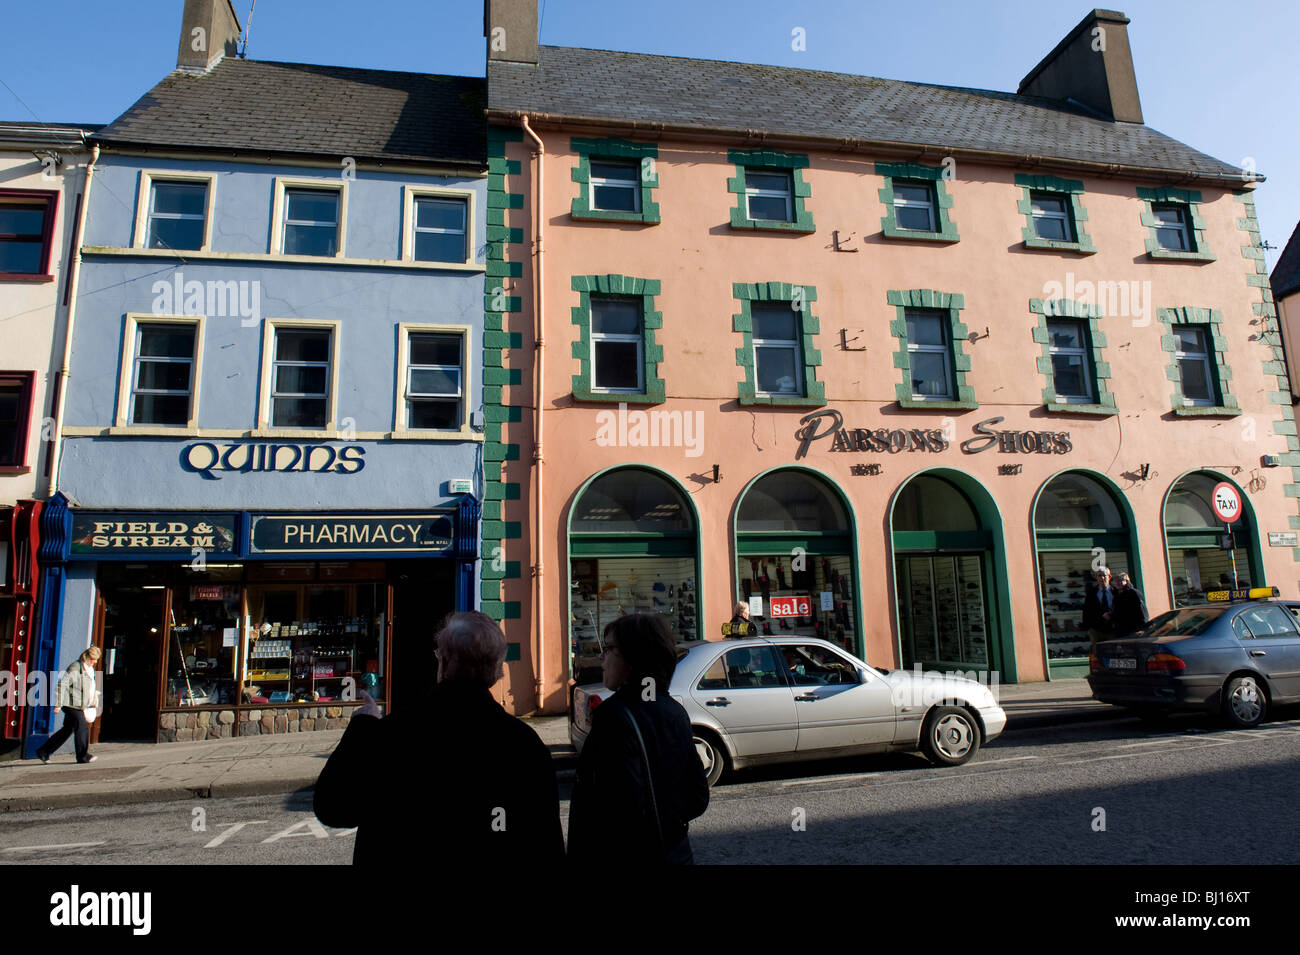 cuddles57 from Castlebar, Ireland - free gay dating / gay singles